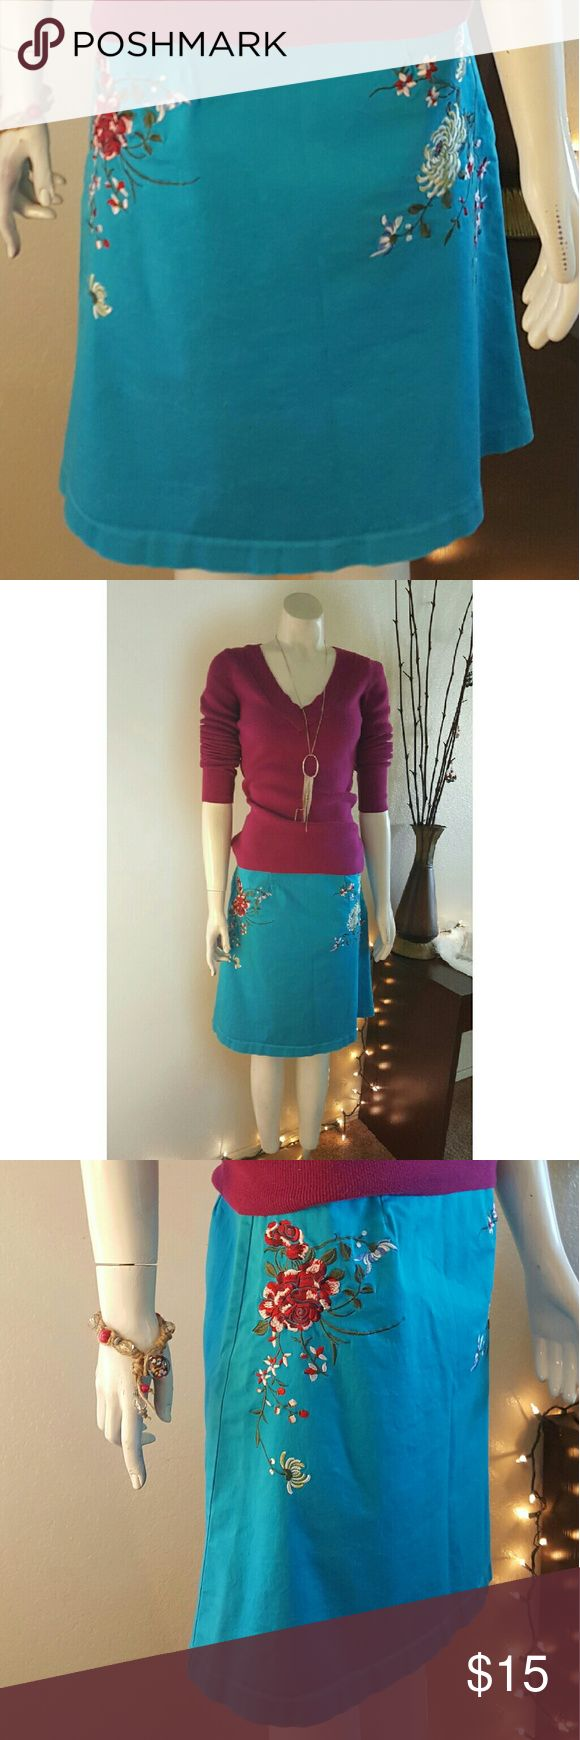 I just added this listing on Poshmark: Autograph New York Turquoise Blue Cotton Skirt. #shopmycloset #poshmark #fashion #shopping #style #forsale #Autograph New York #Dresses & Skirts